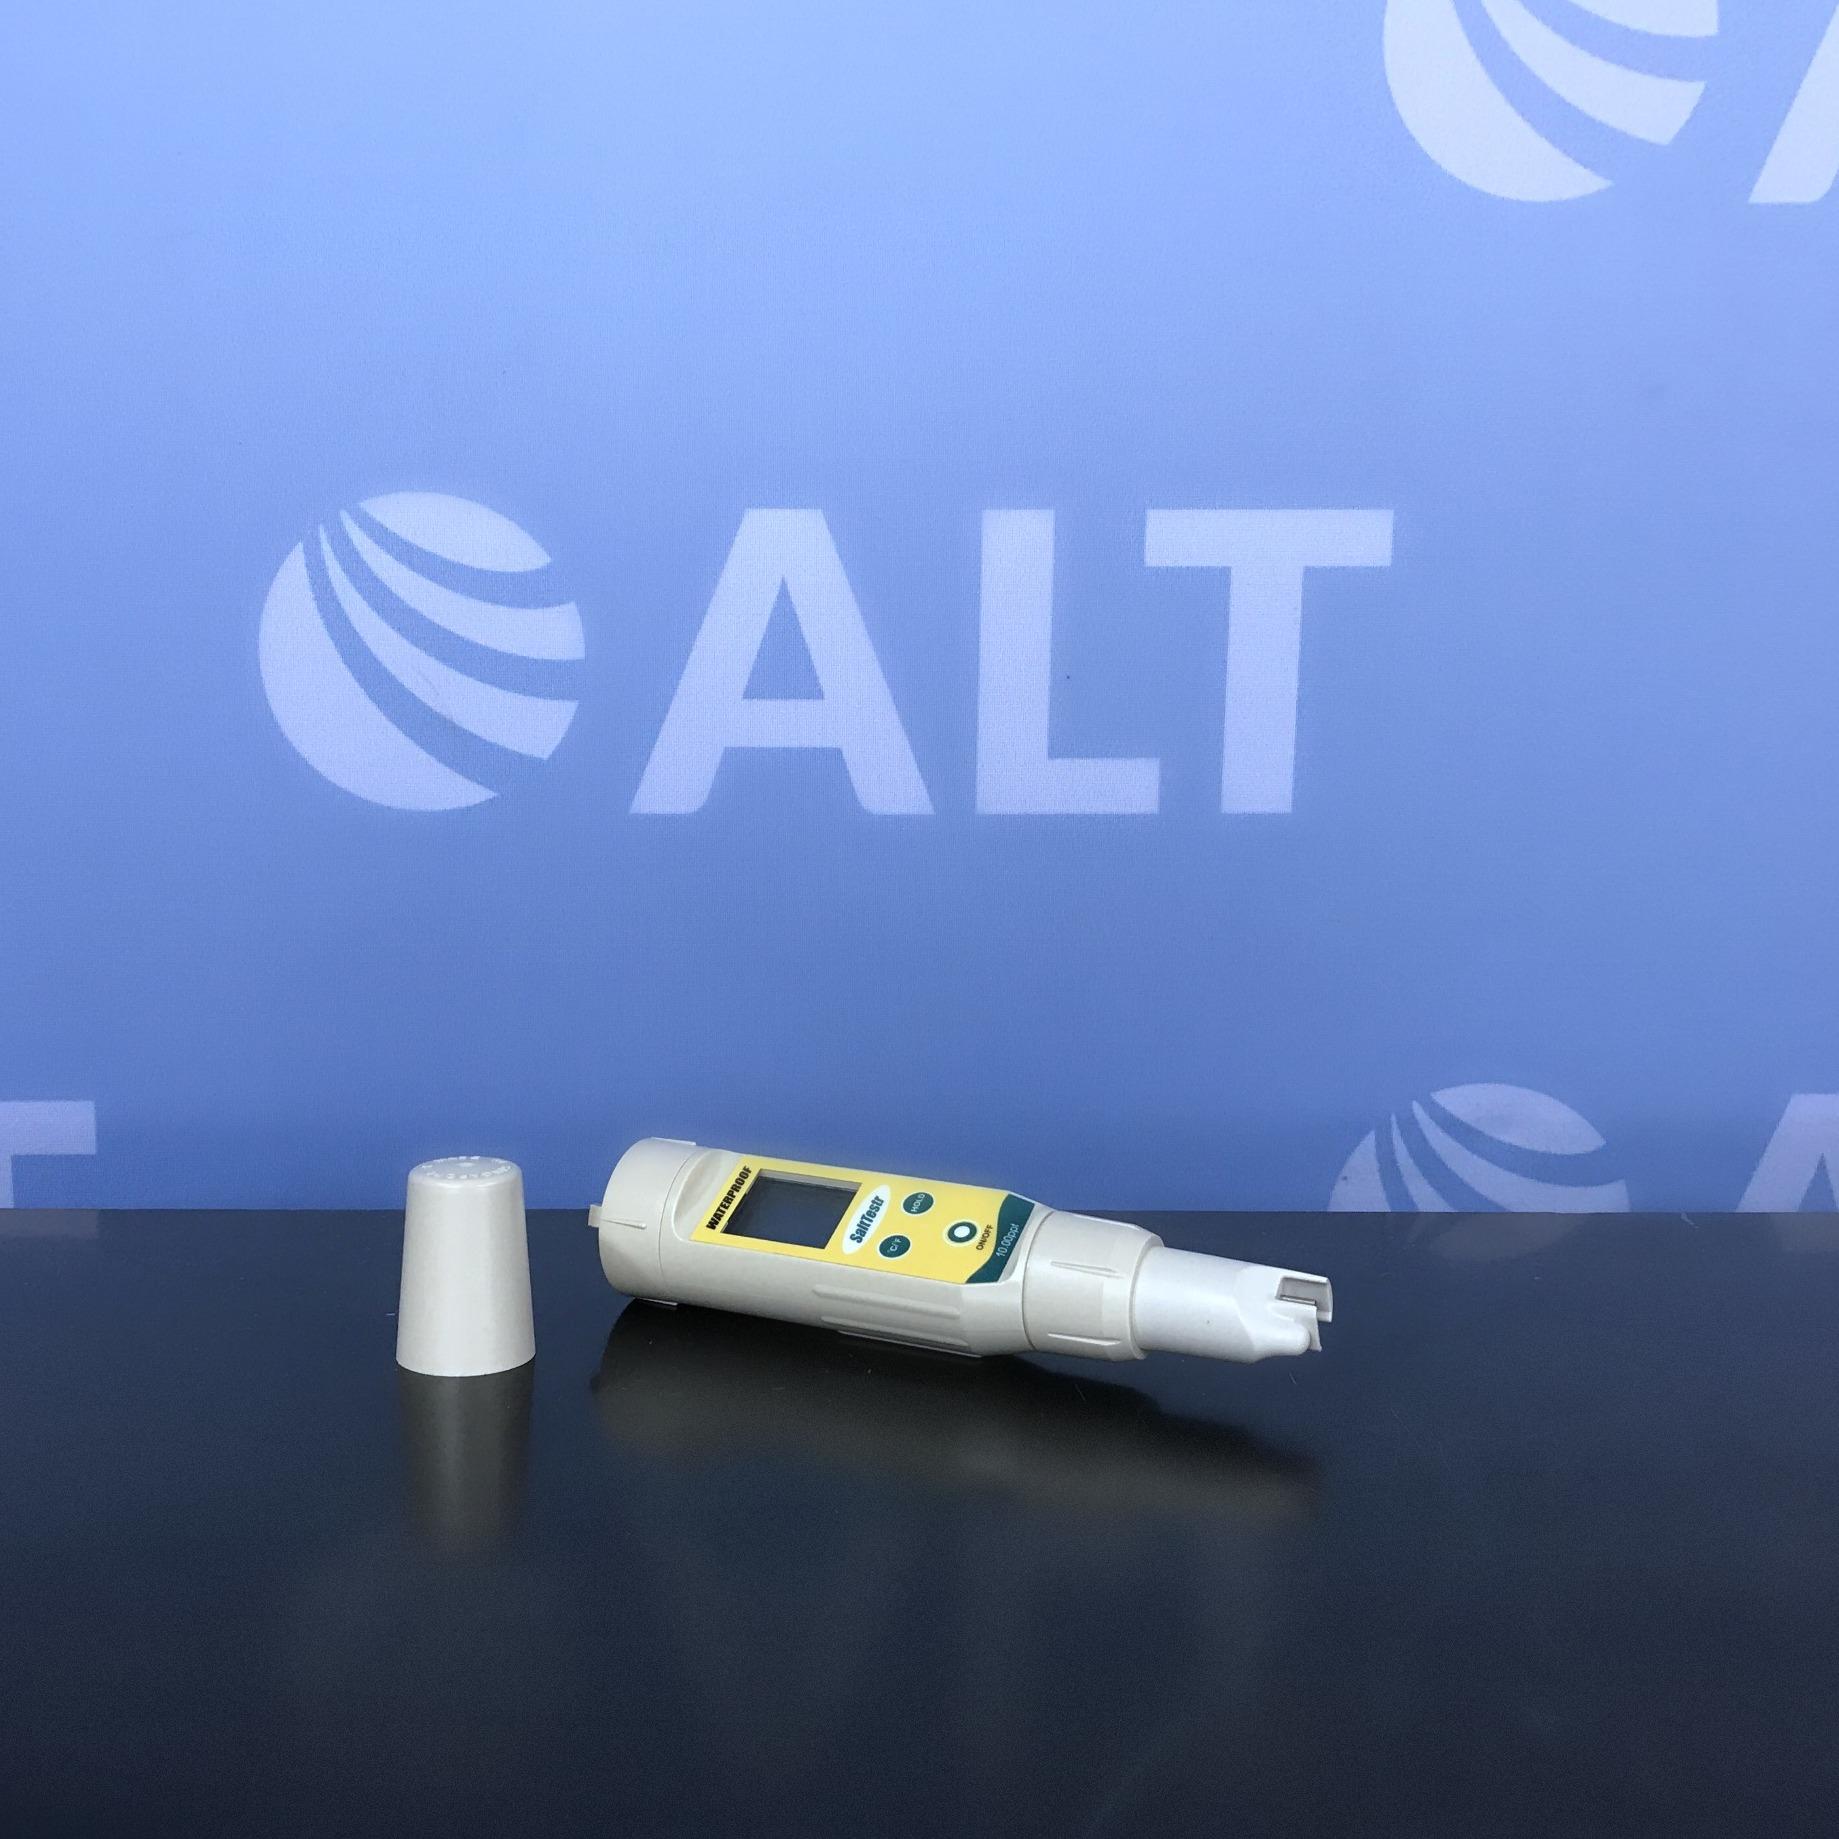 Oakton SaltTestr Pocket Salinity Tester Image